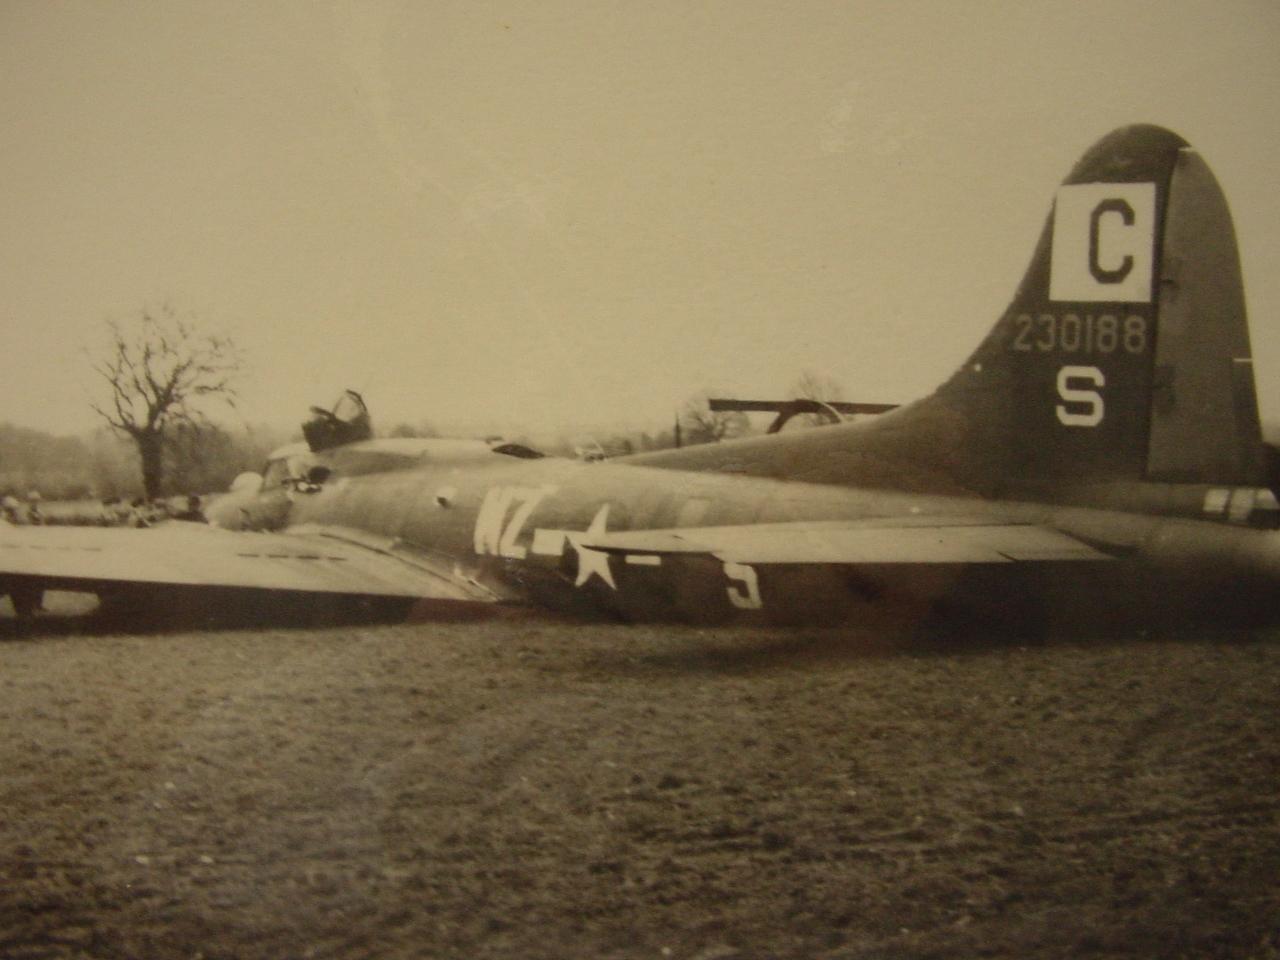 B-17 #42-30188 / Temptation